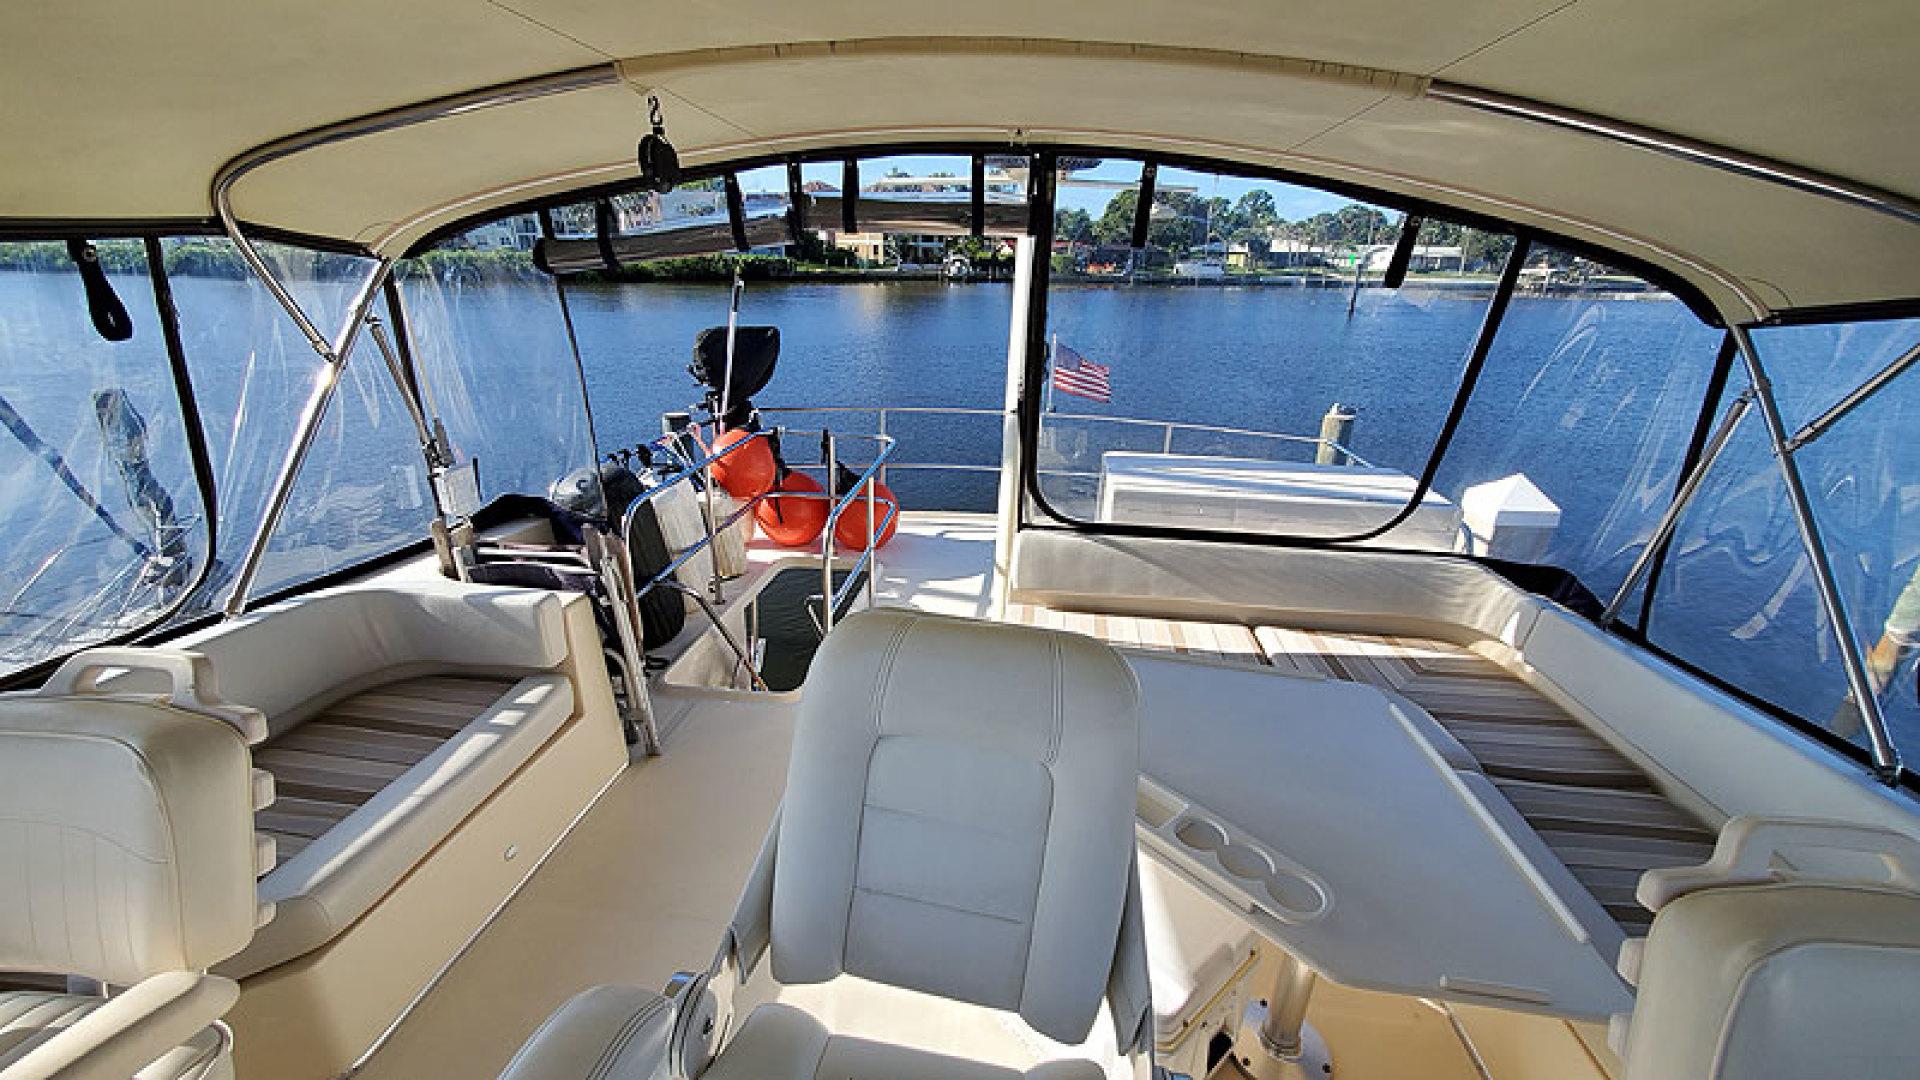 Mainship-430 Sedan 2006-Windy Cove II Venice-Florida-United States-1266394 | Thumbnail